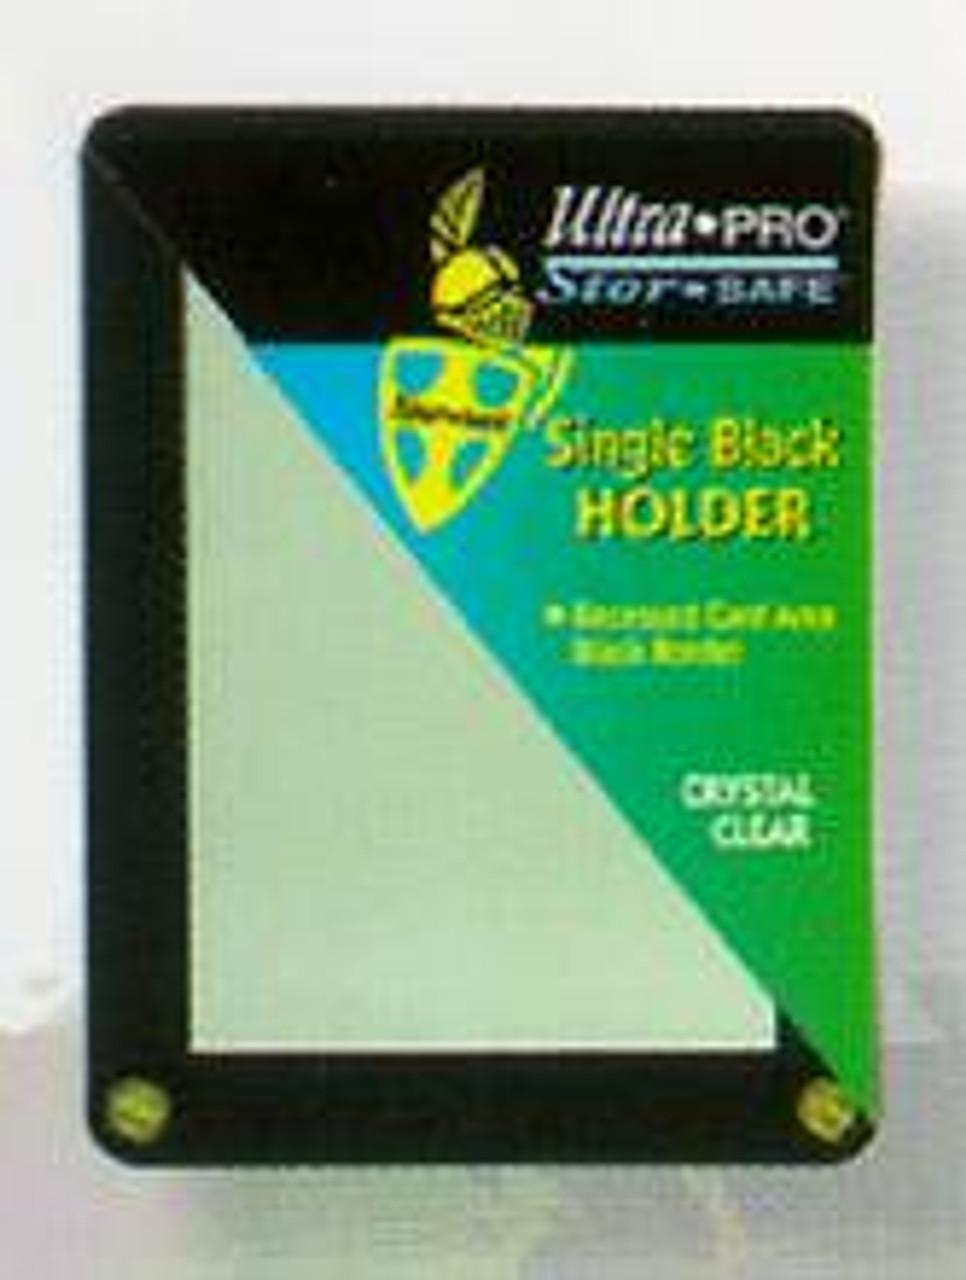 Single Black Holder